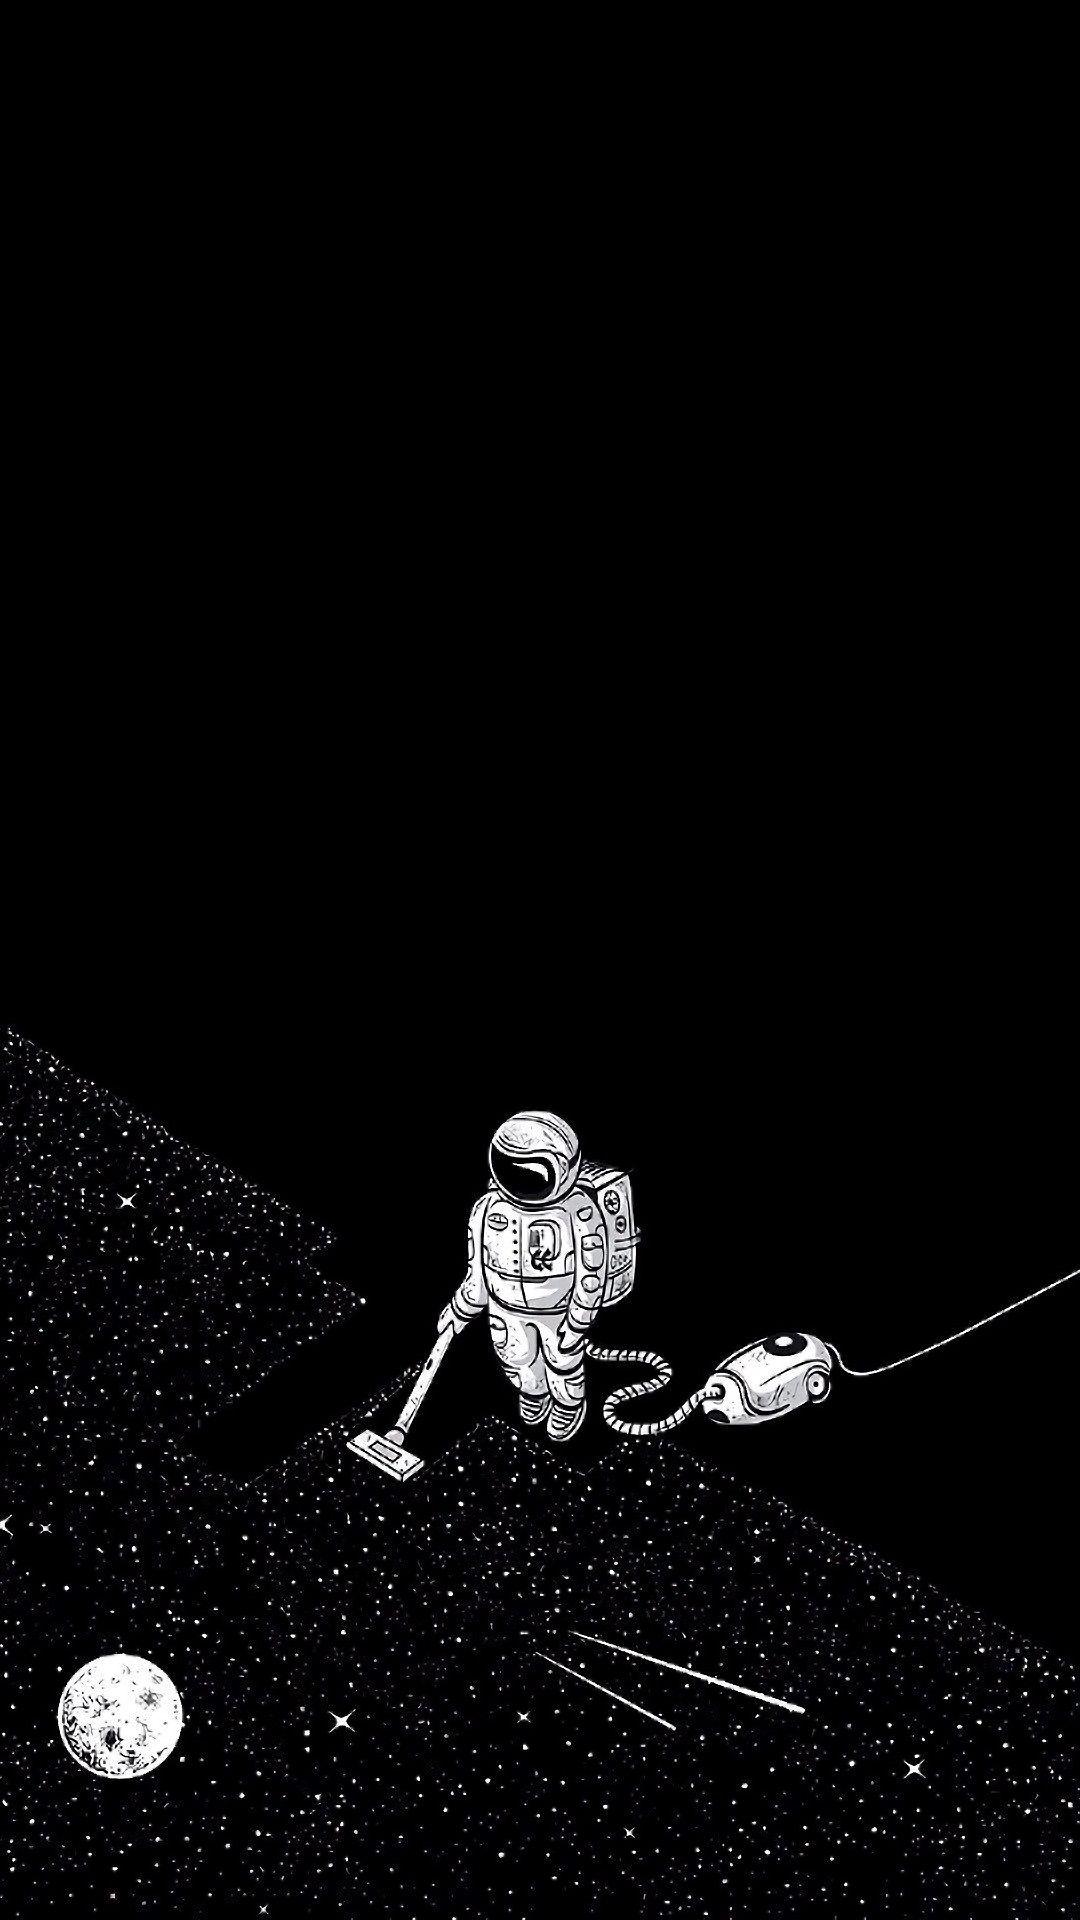 Astronaut Vacuuming Space Wallpaper Wallpapershit